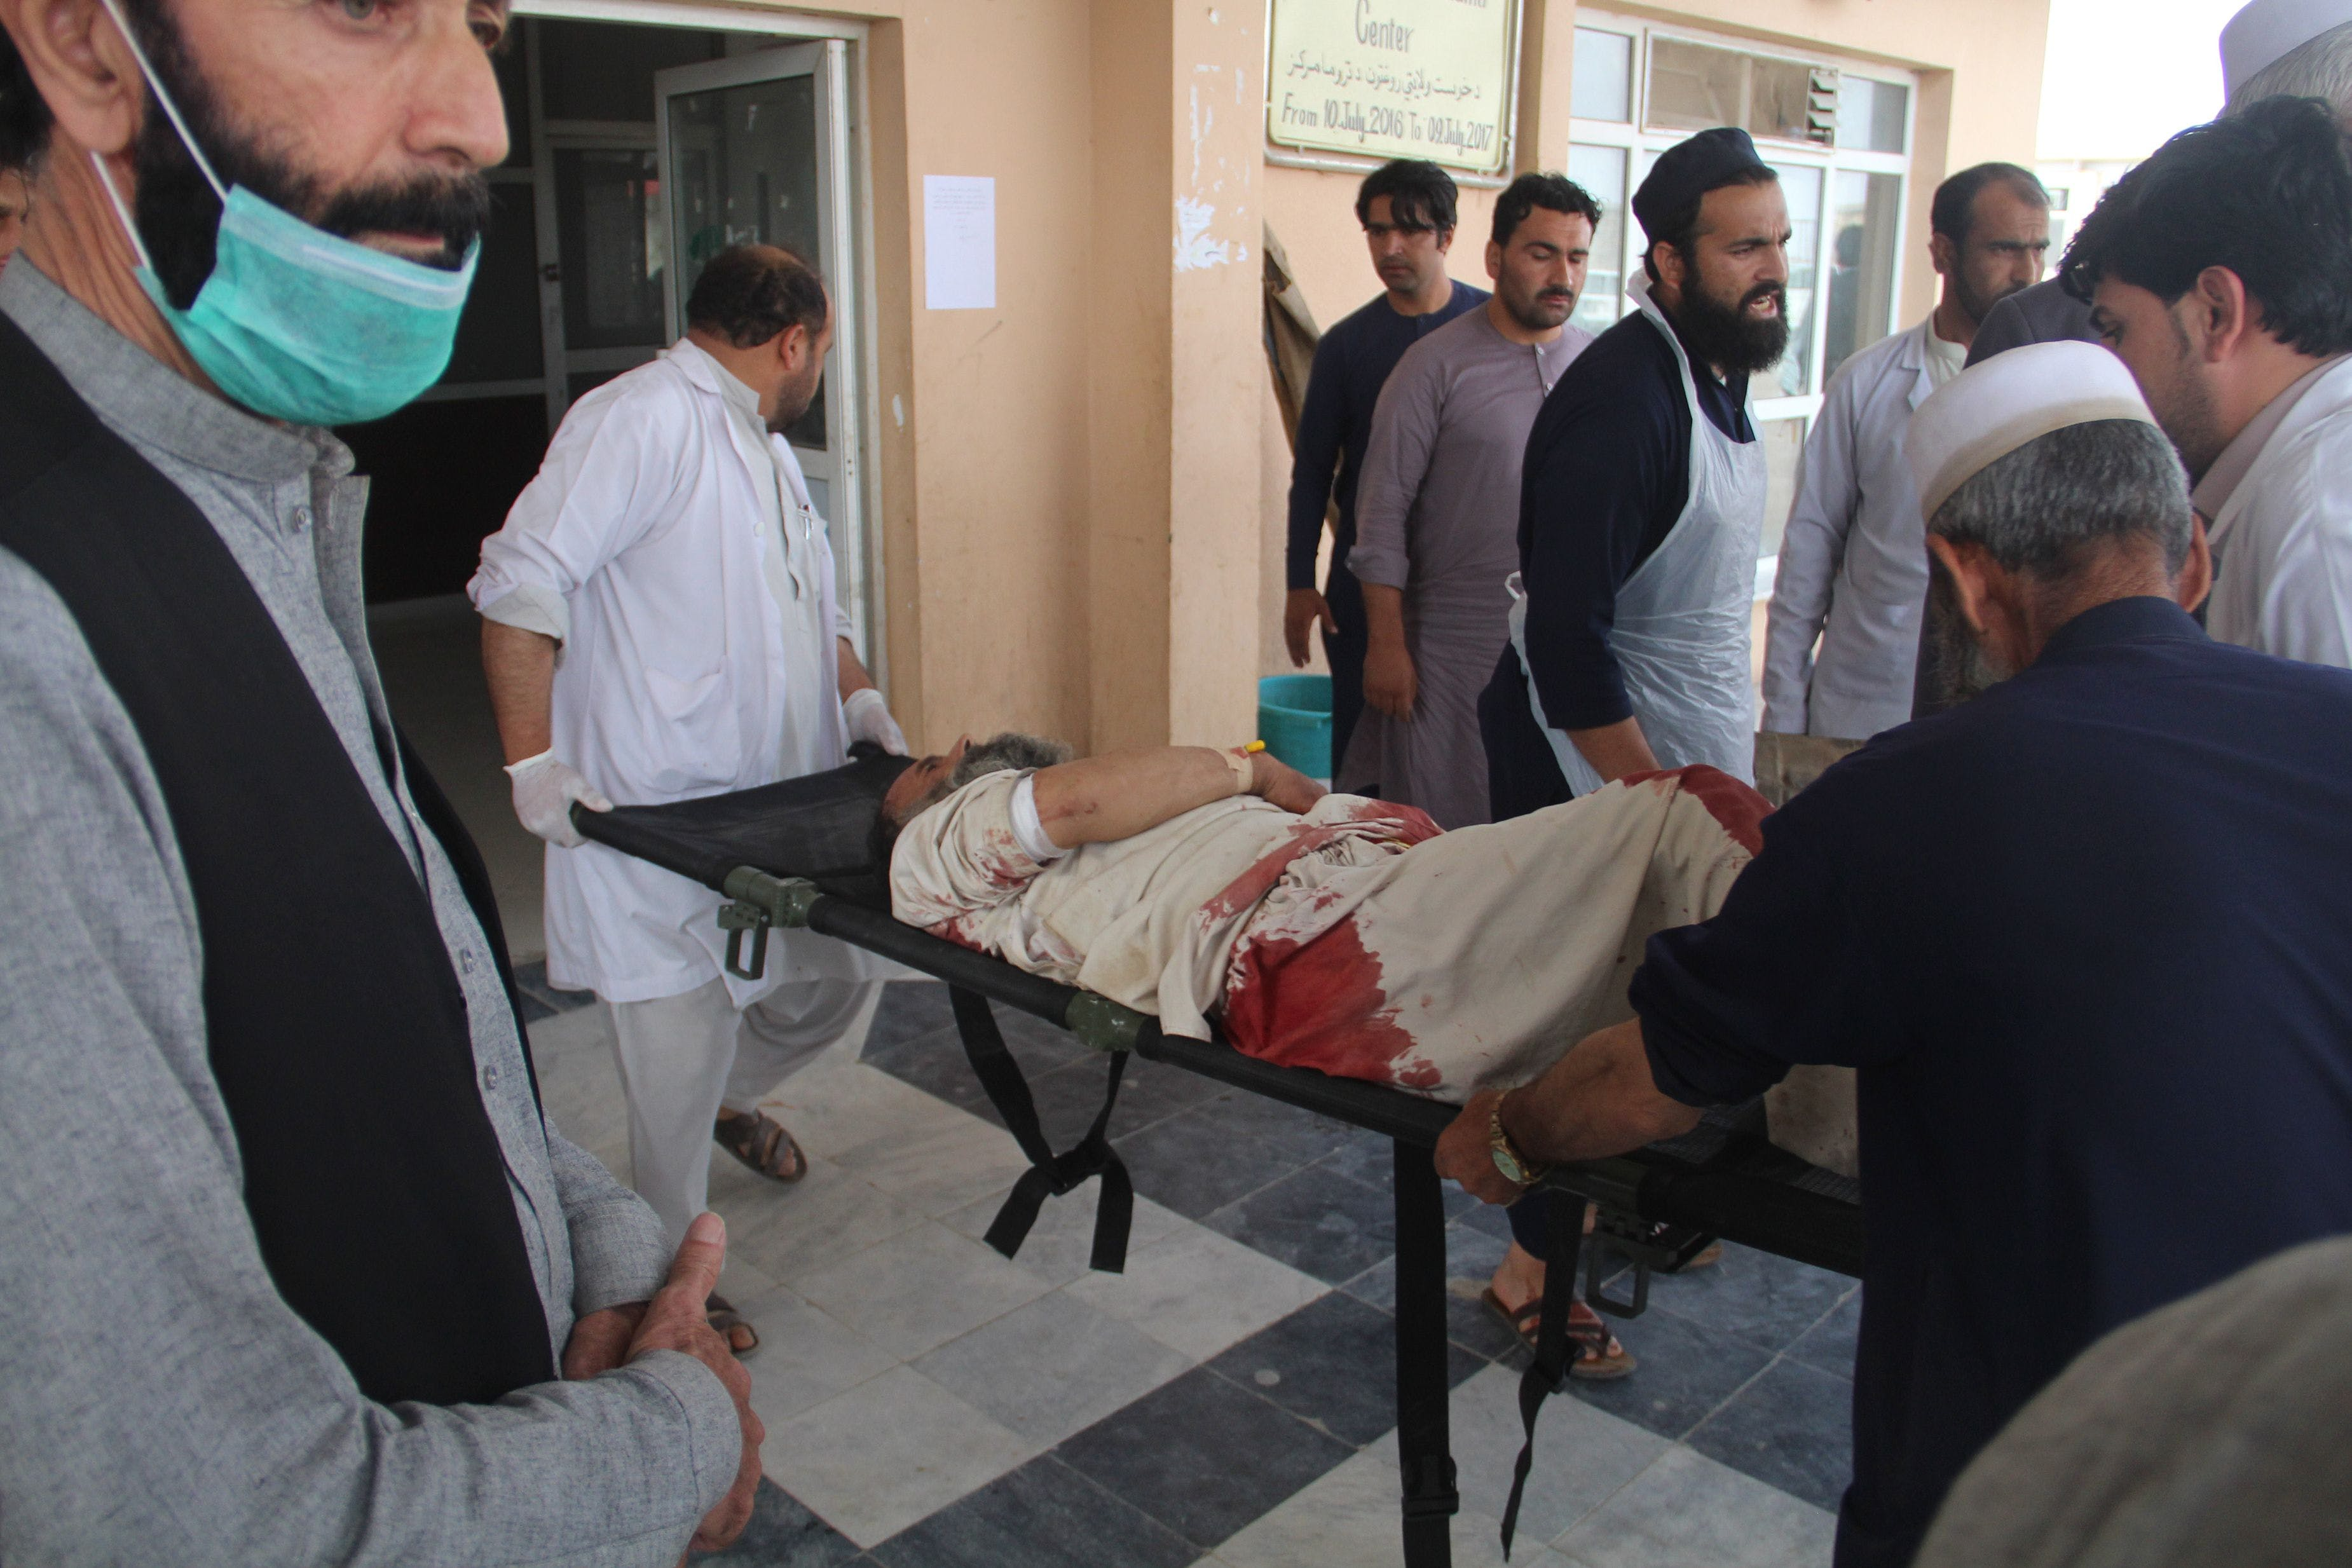 Viele Tote bei Selbstmordanschlag in Moschee